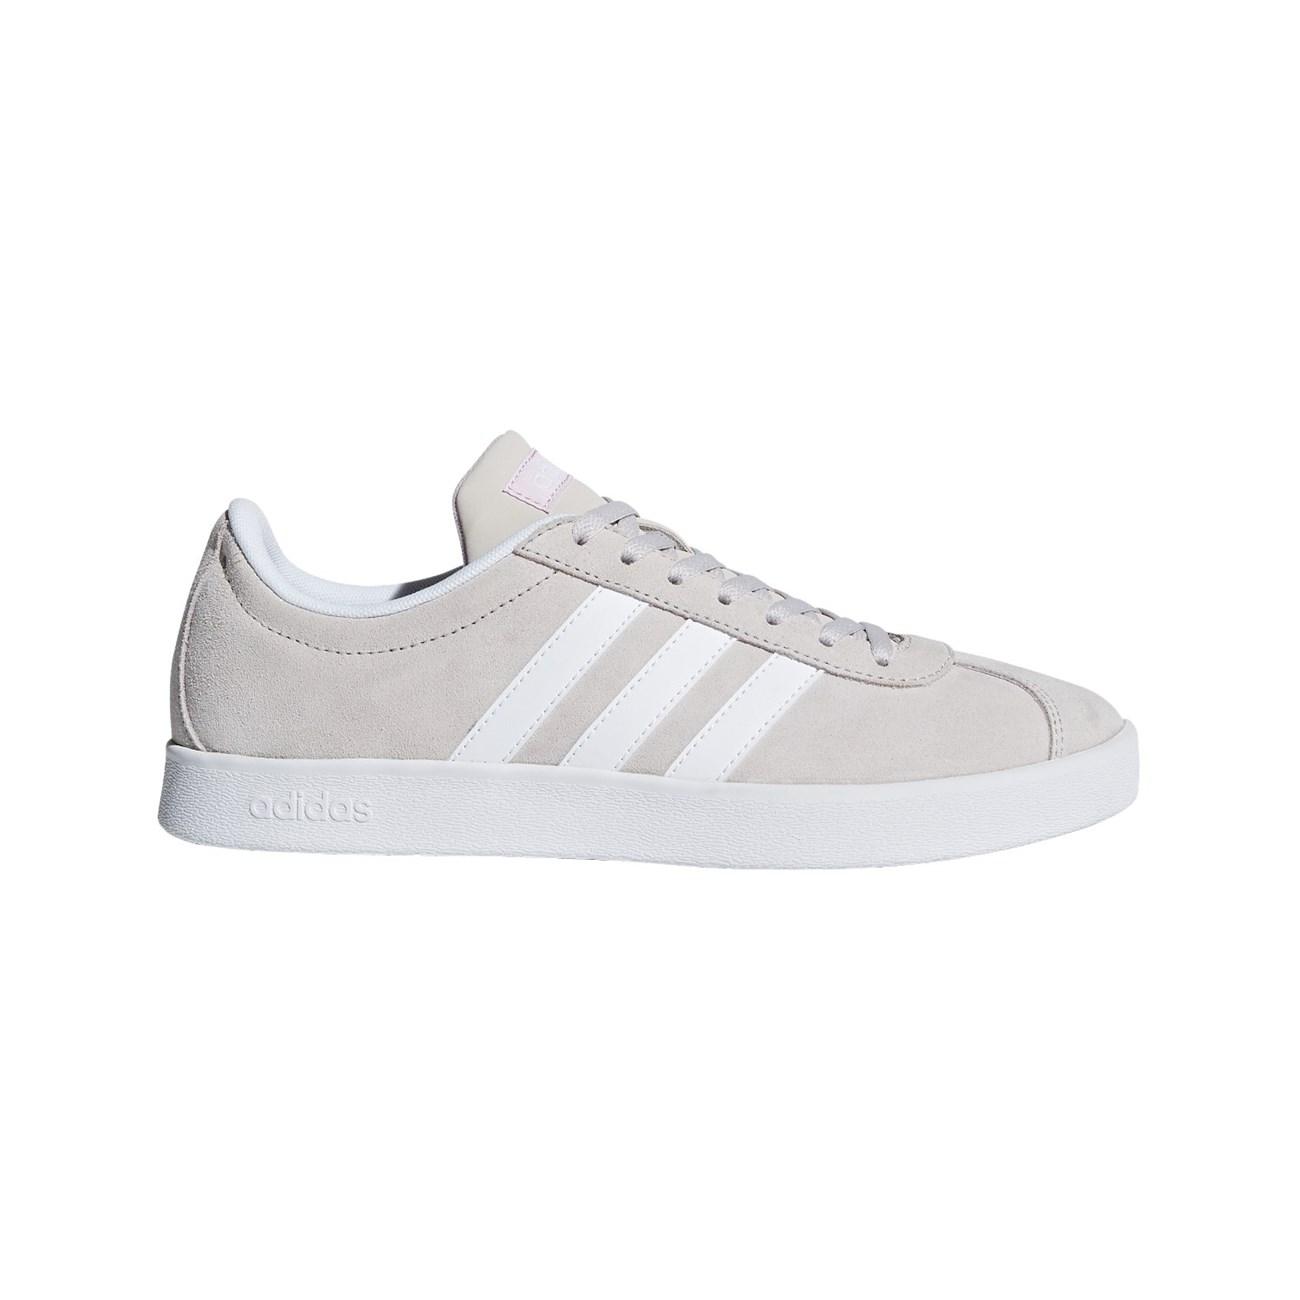 ADIDAS VL COURT 2.0 W   Sportstyle Παπούτσια  d355f6ef3f9